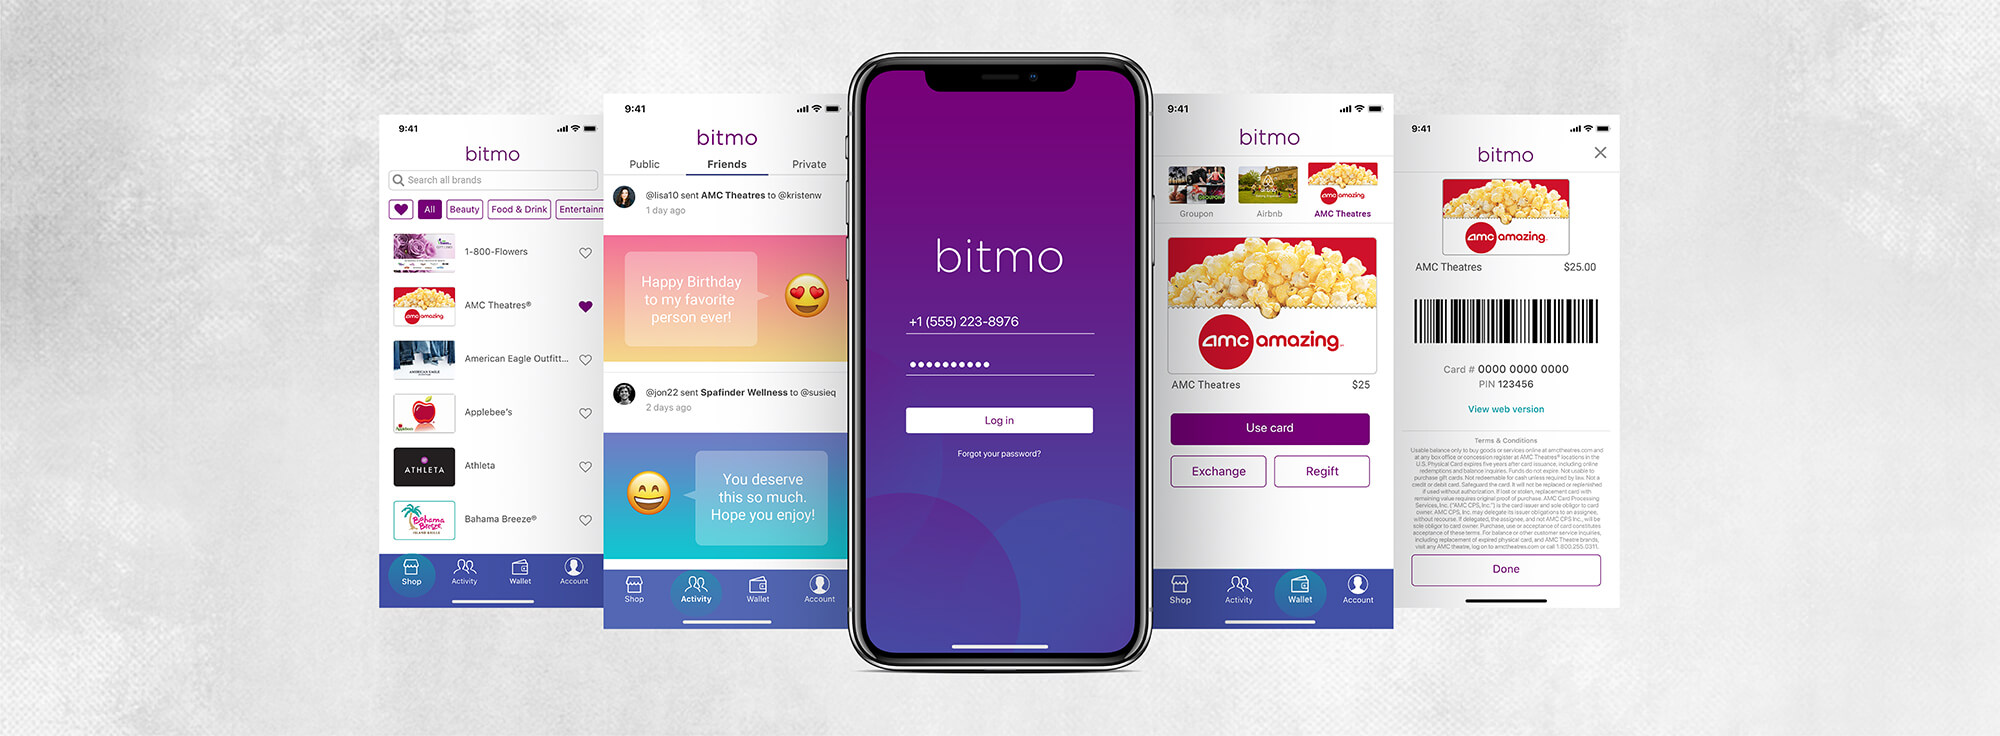 Bitmo Gifting Platform Case Study Image